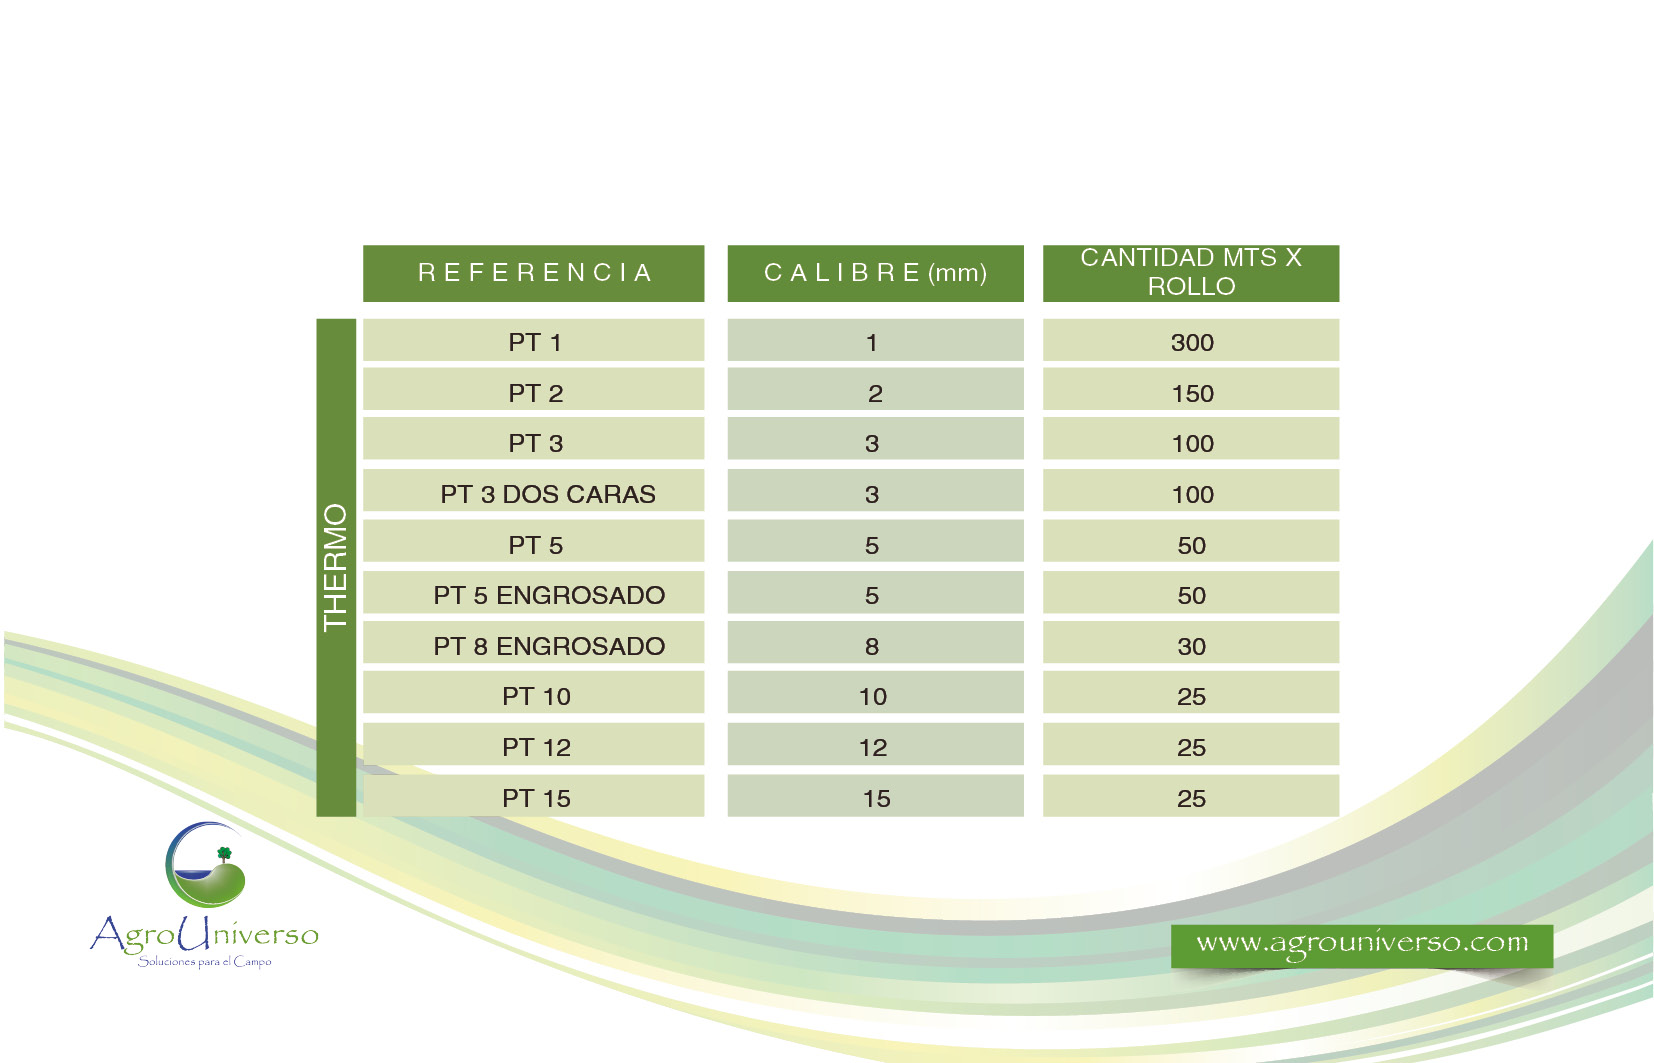 Catlogo-de-productos-Agrouniverso-35